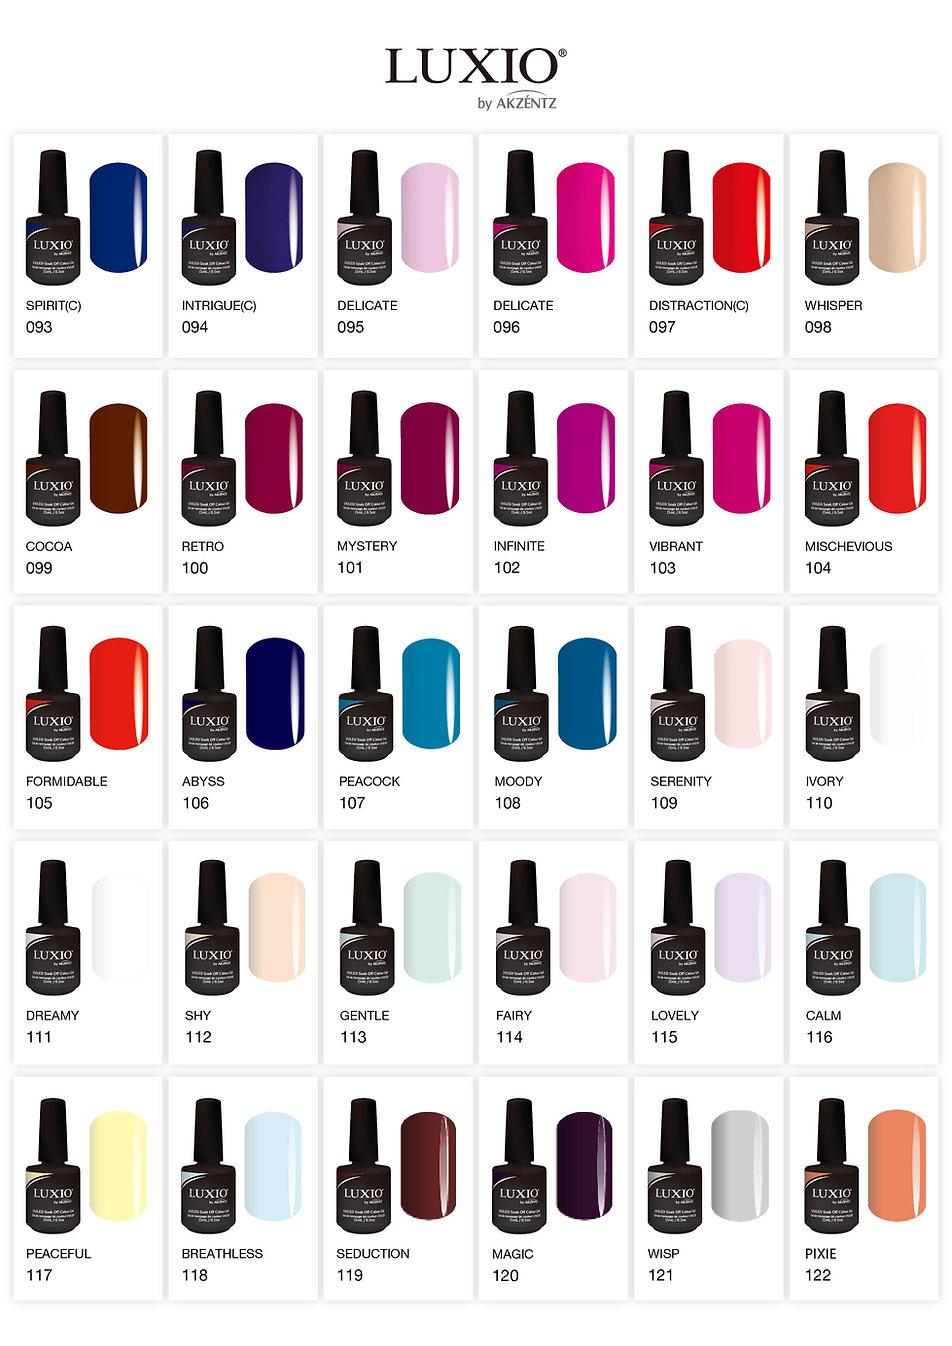 LUXIO-colors&bottle-3.jpg